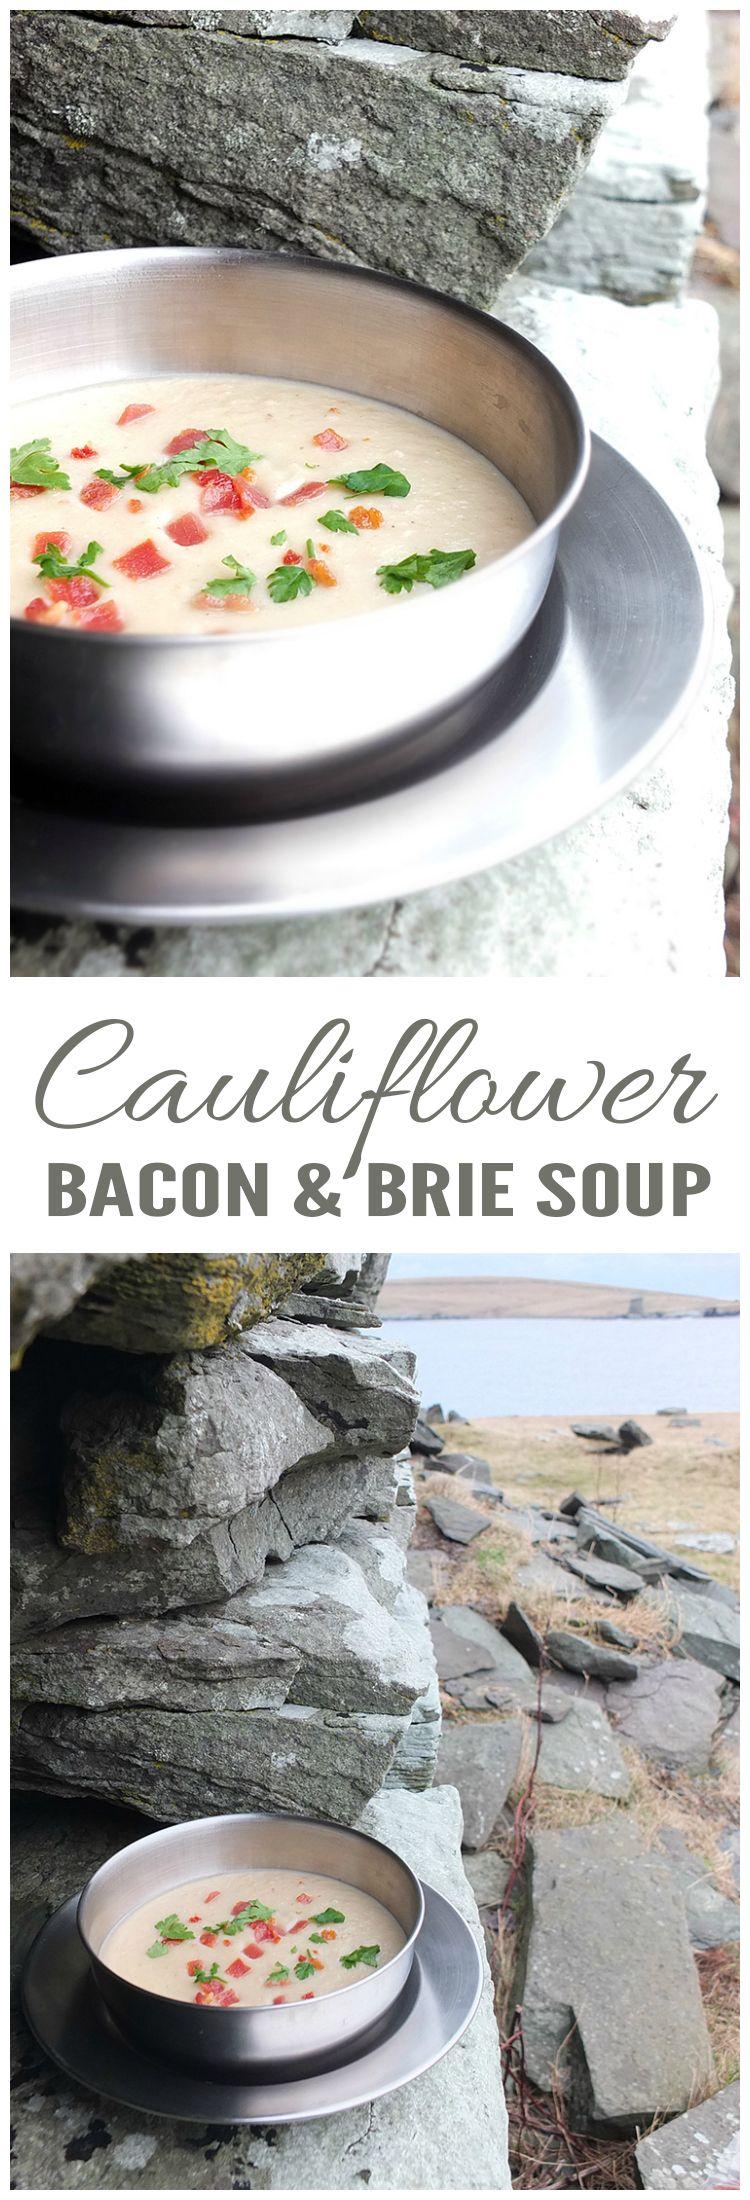 Cauliflower, Bacon & Brie Soup | Recipe | Cauliflower soup, Brie and ...